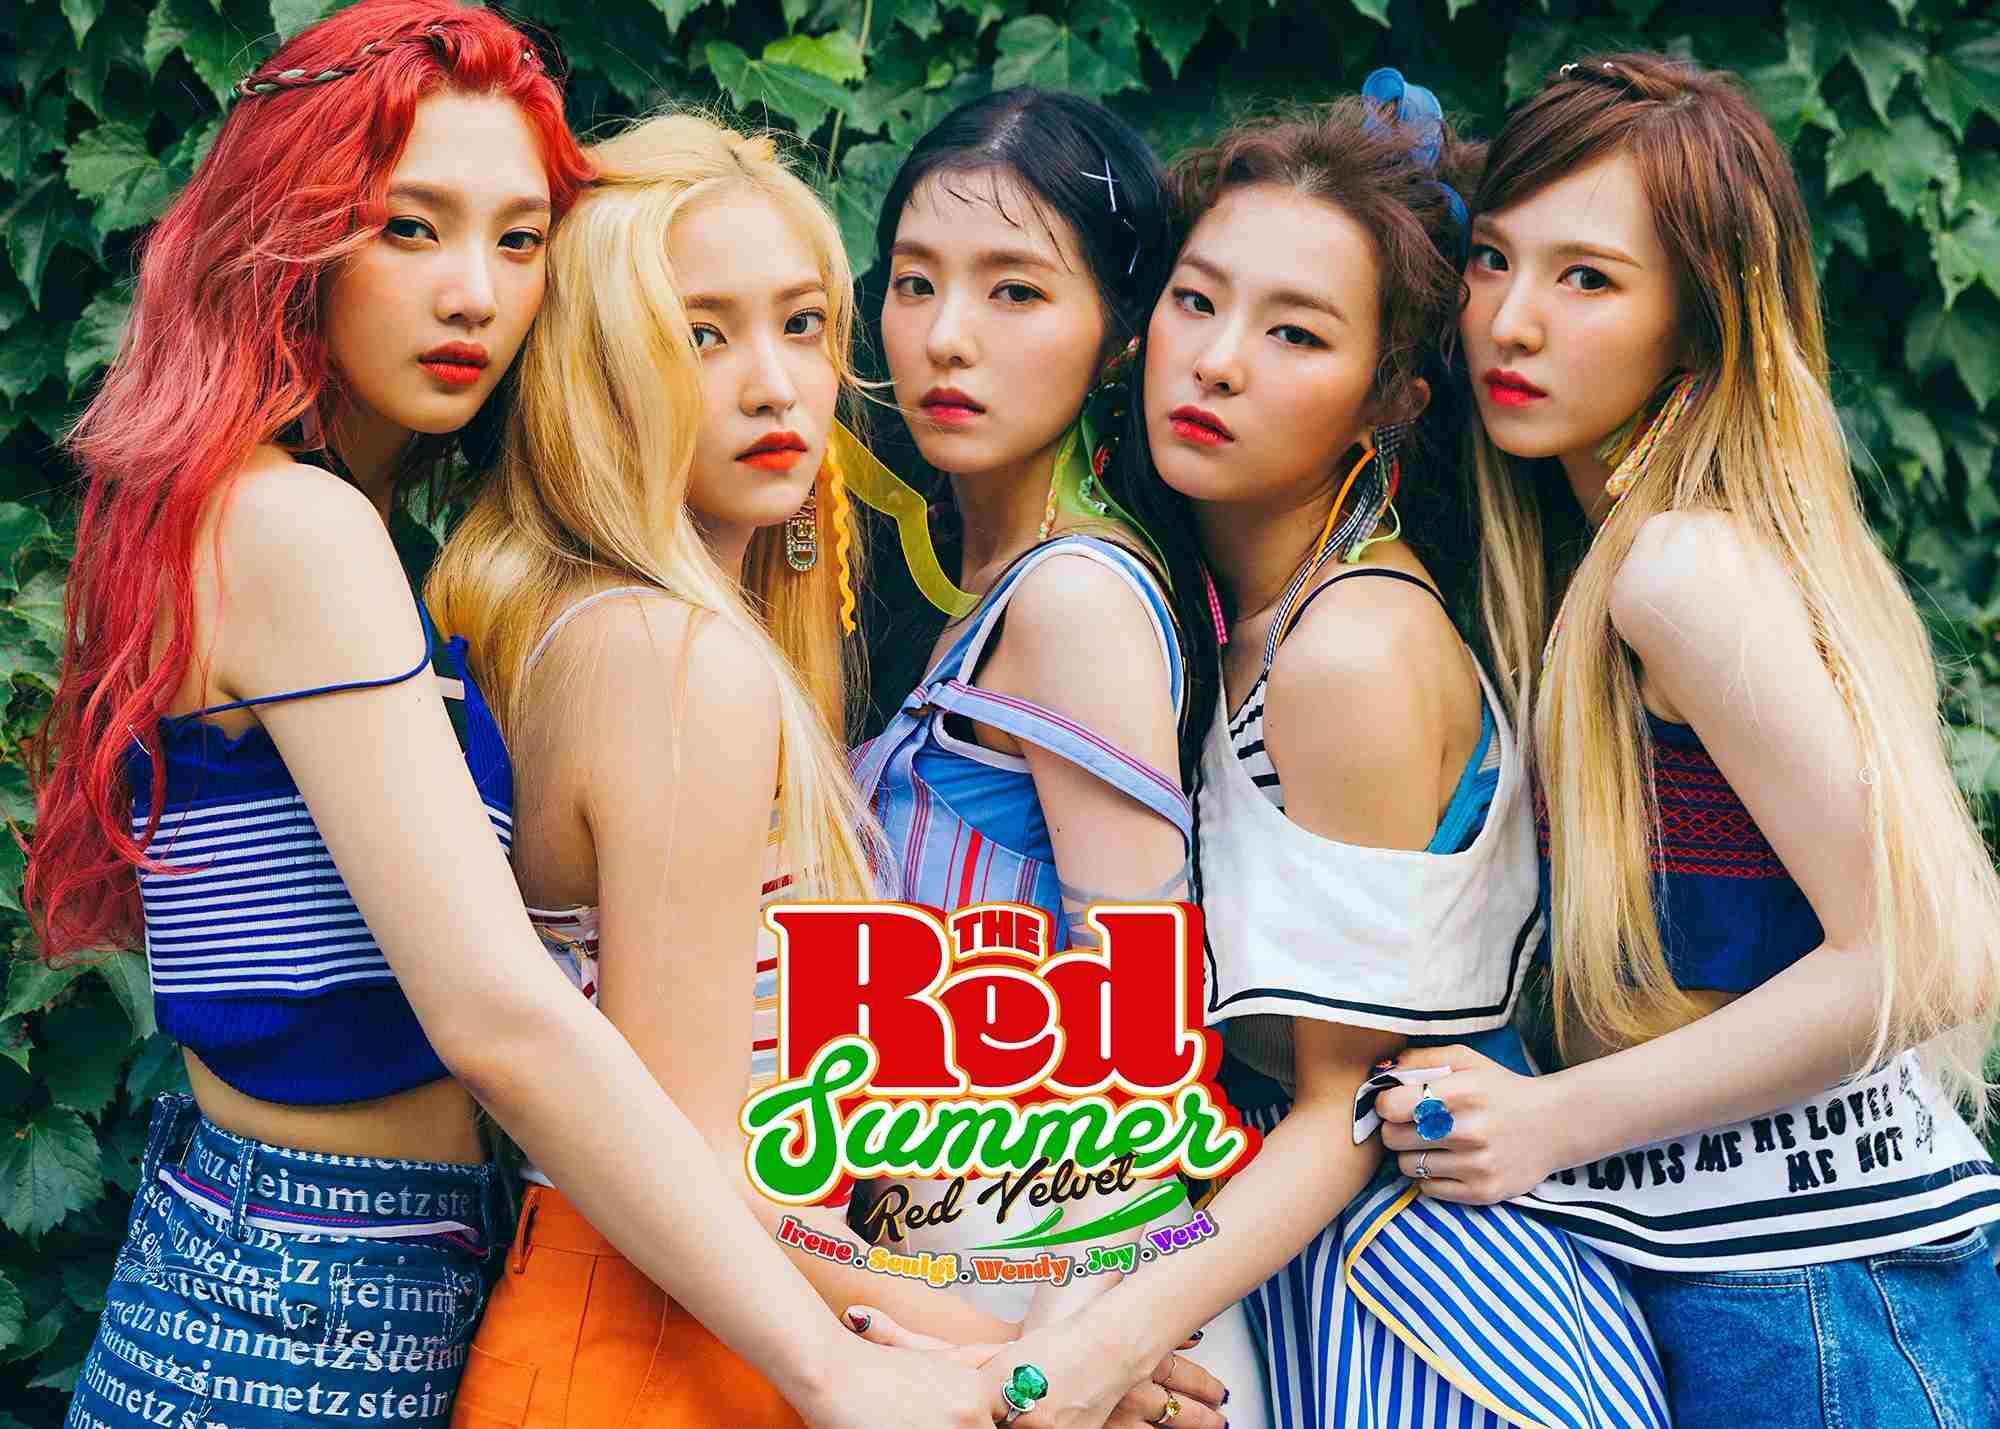 TOP3 Red Velvet 最近Red Velvet的人氣也是不停的在增長啊~這次帶著夏日迷你專輯回歸的貝貝,可說是迎來了新的全盛時期~不僅打破了多項自身創造的紀錄,新歌的反響也是相當不錯呢! 而Red Velvet的歌曲《Dumb Dumb》也於近日被美國告示板Billboard選為《有史來最棒的100首女團歌曲》的70名,恭喜貝貝~